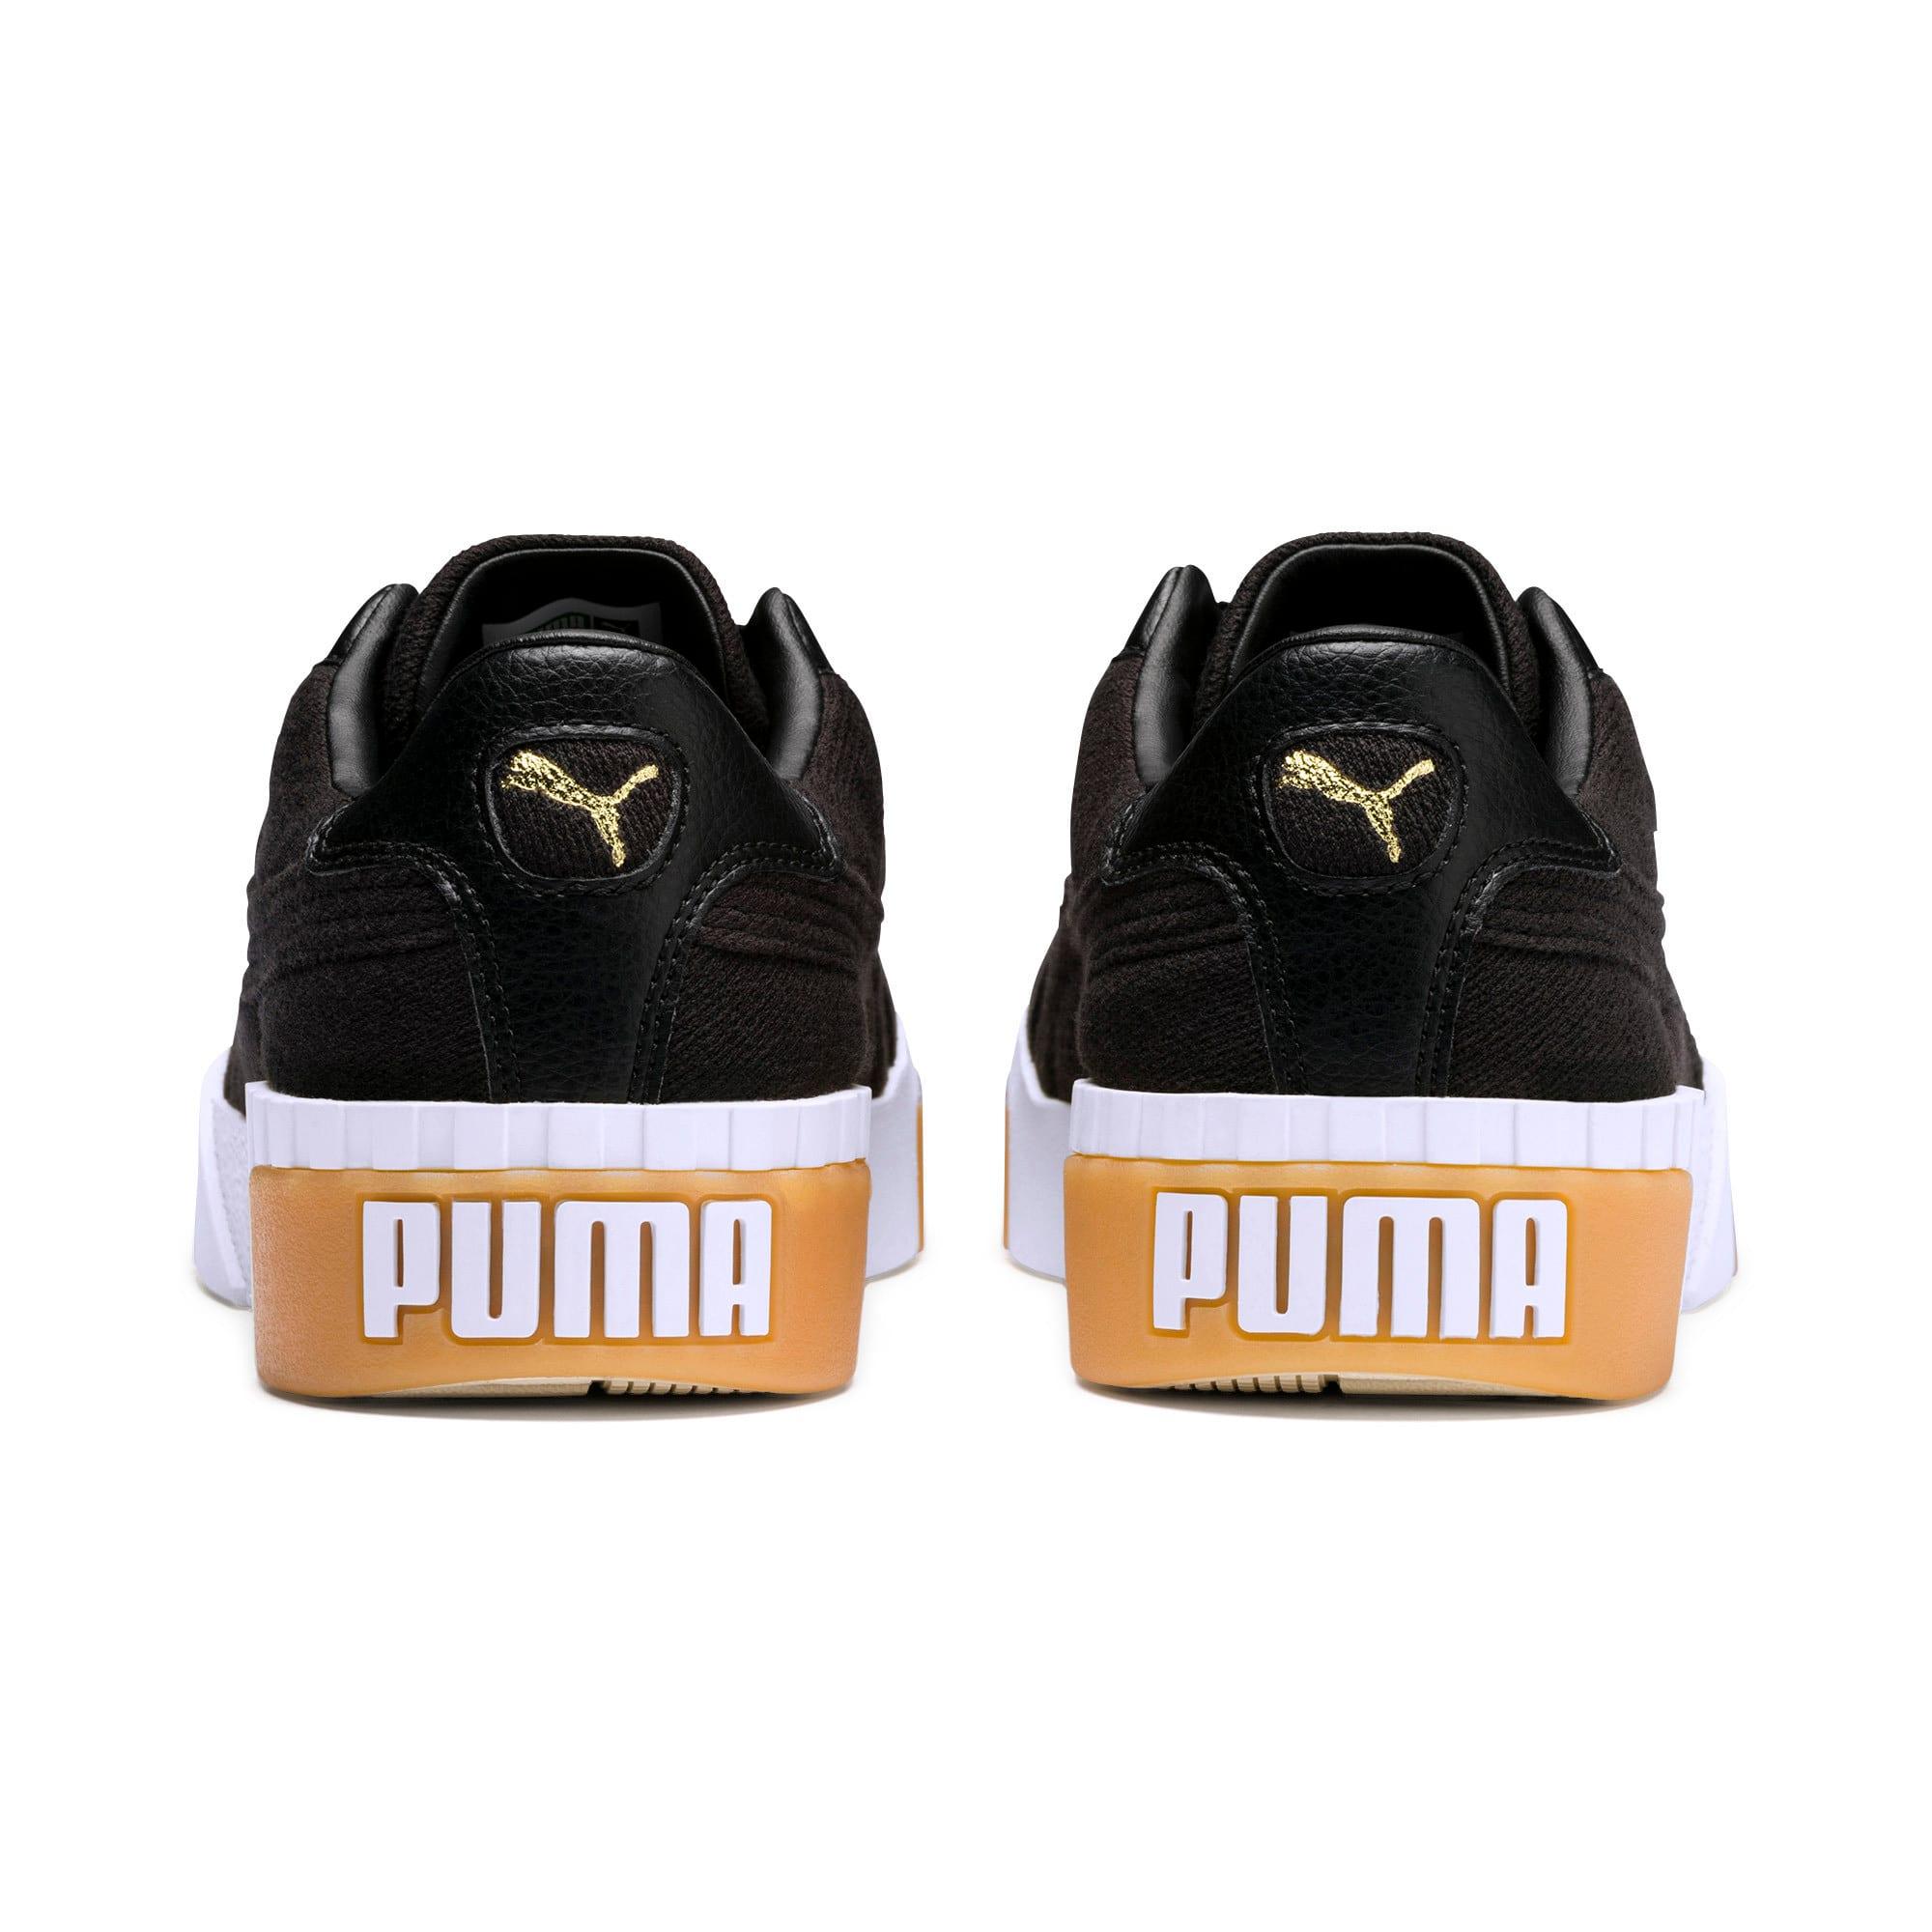 Thumbnail 3 of Cali Exotic Women's Sneakers, Puma Black-Puma Black, medium